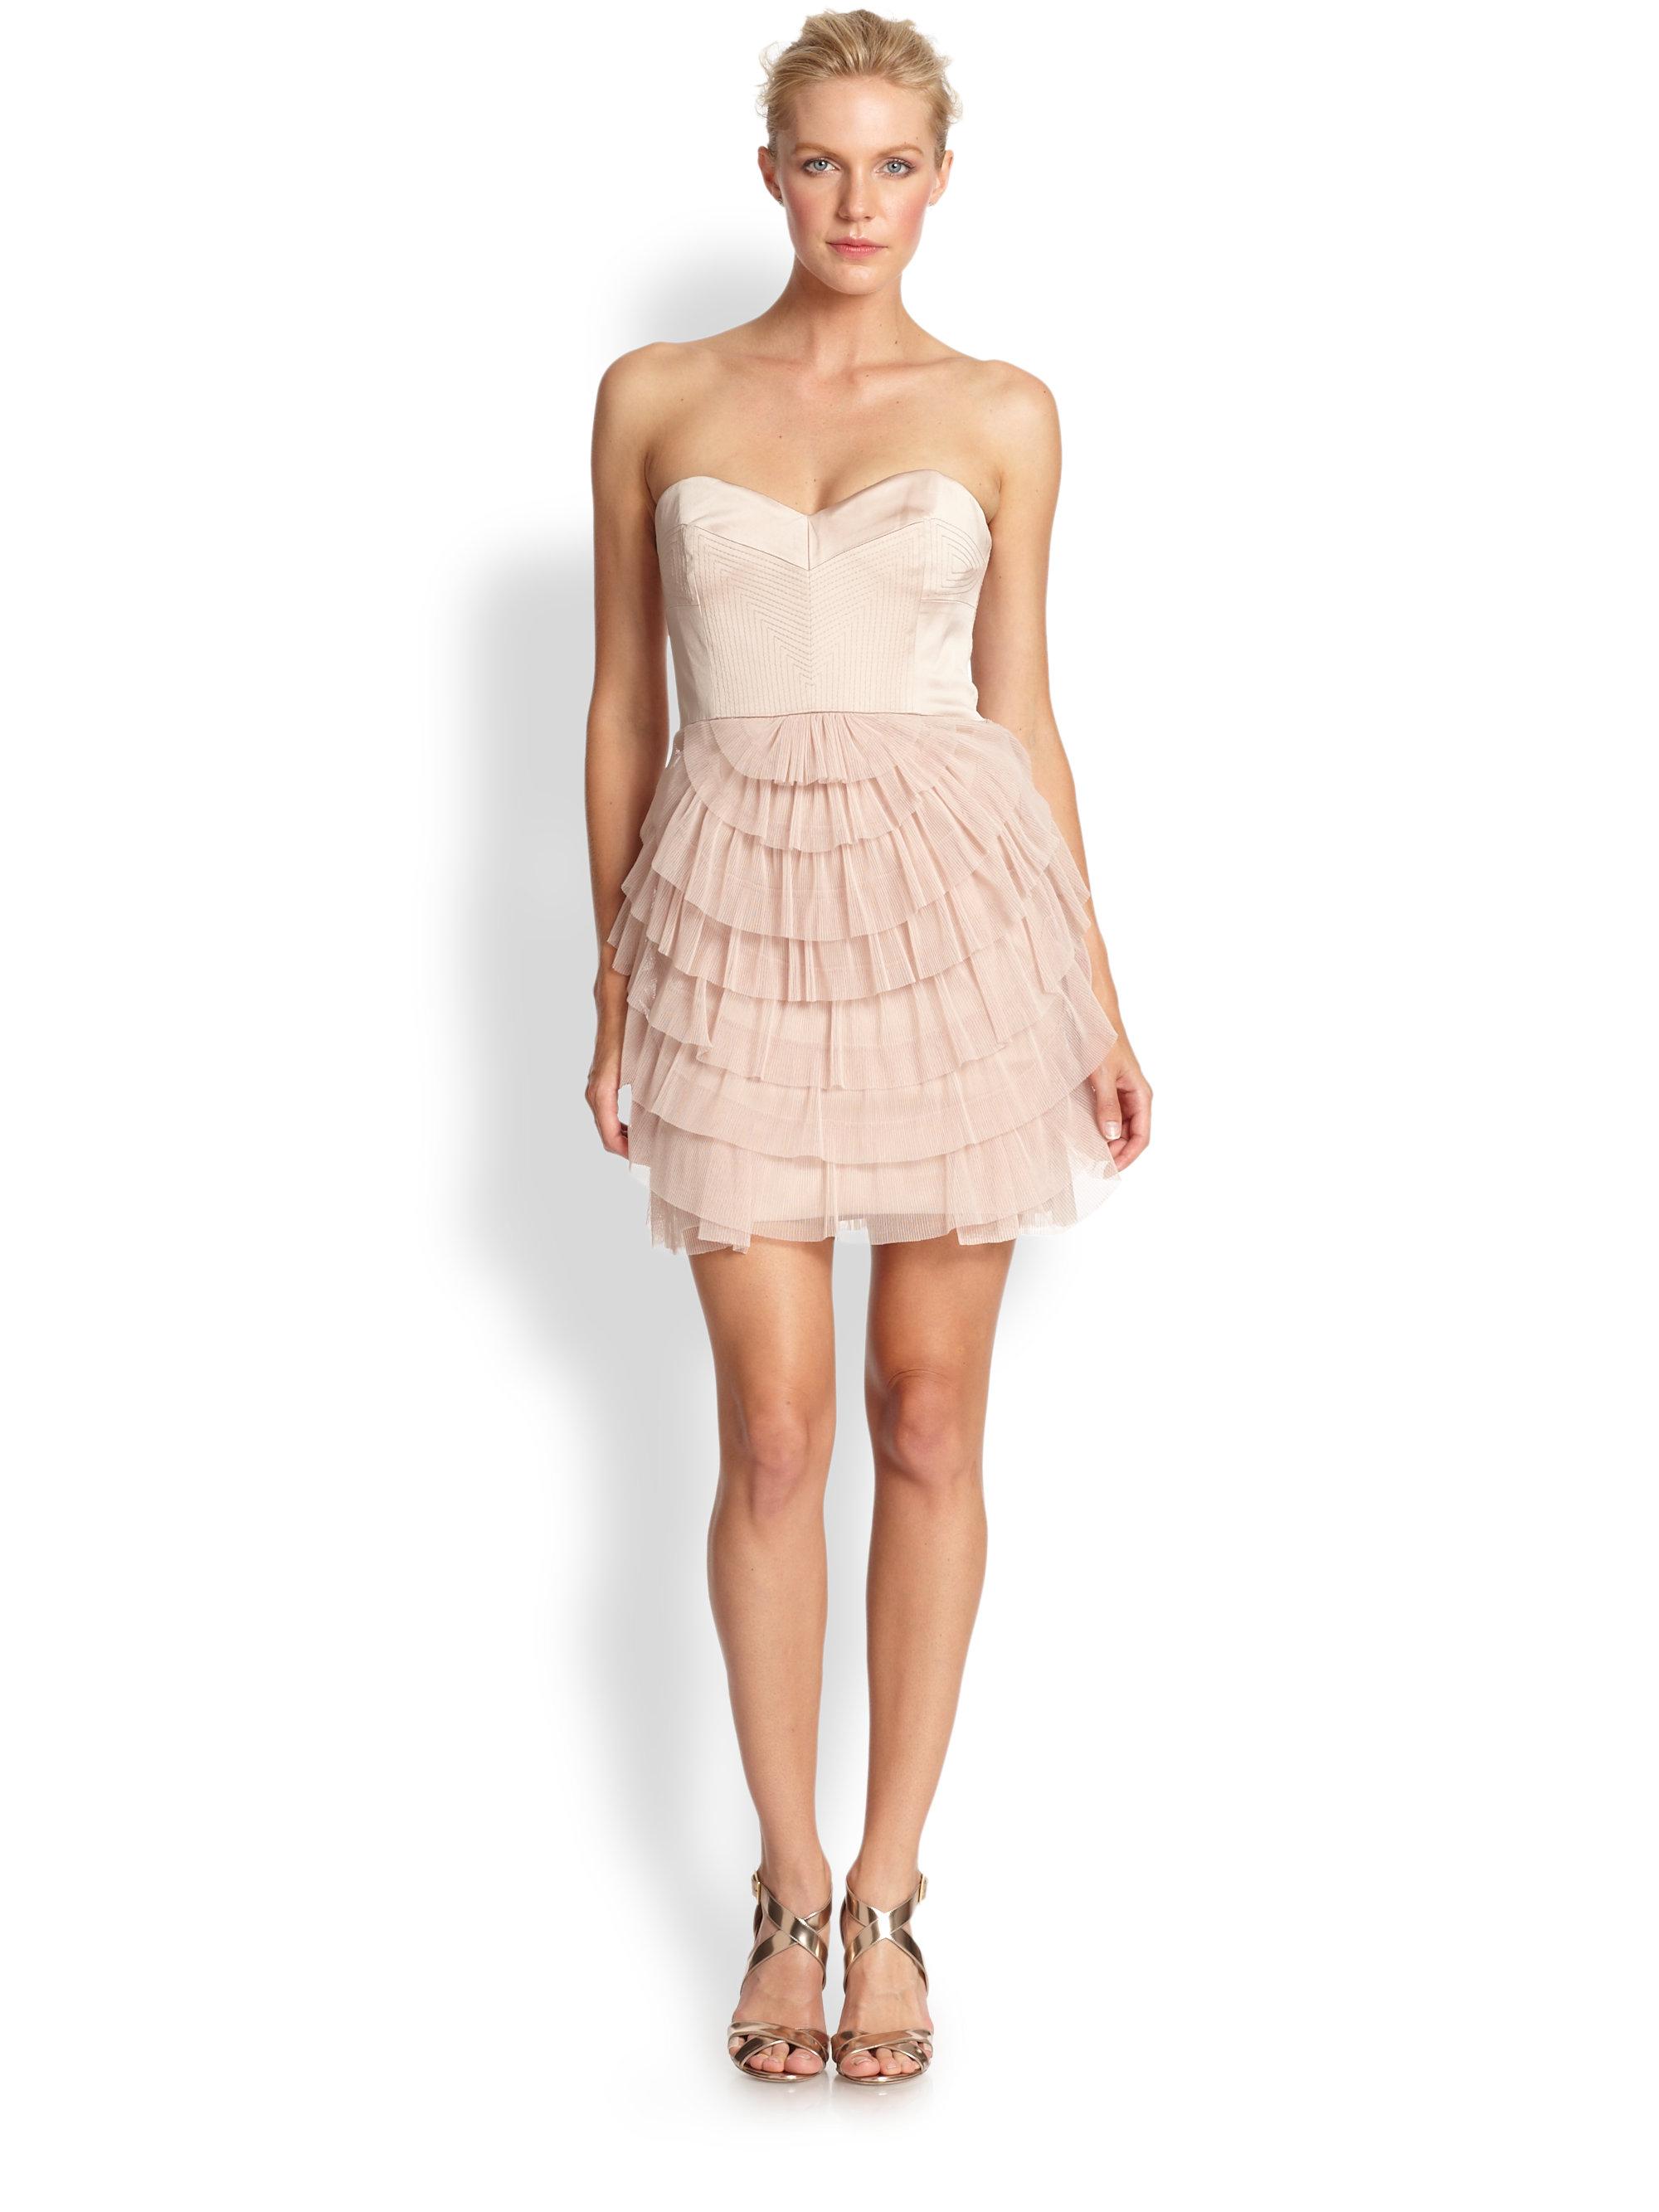 Lyst - Bcbgmaxazria Strapless Tiered Tulle Dress in Pink